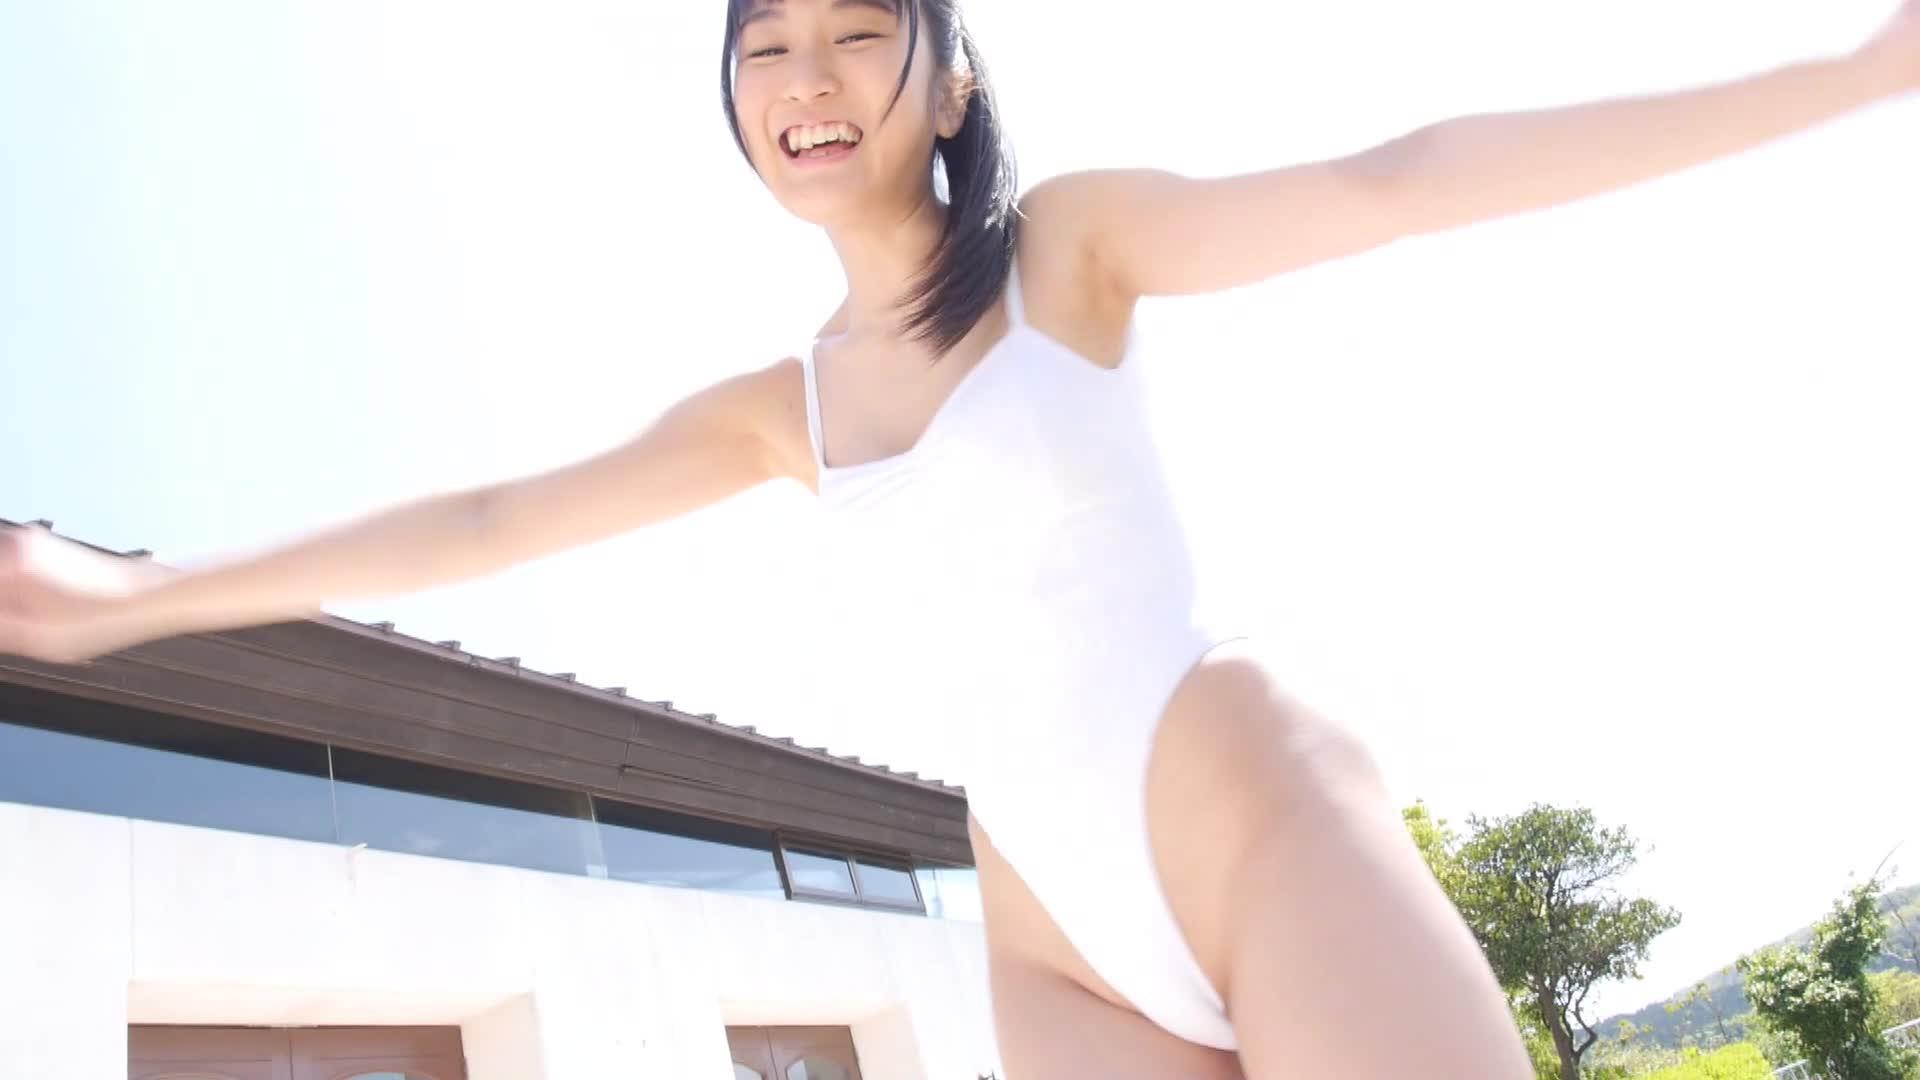 c5 - 卒業の約束/片瀬美月